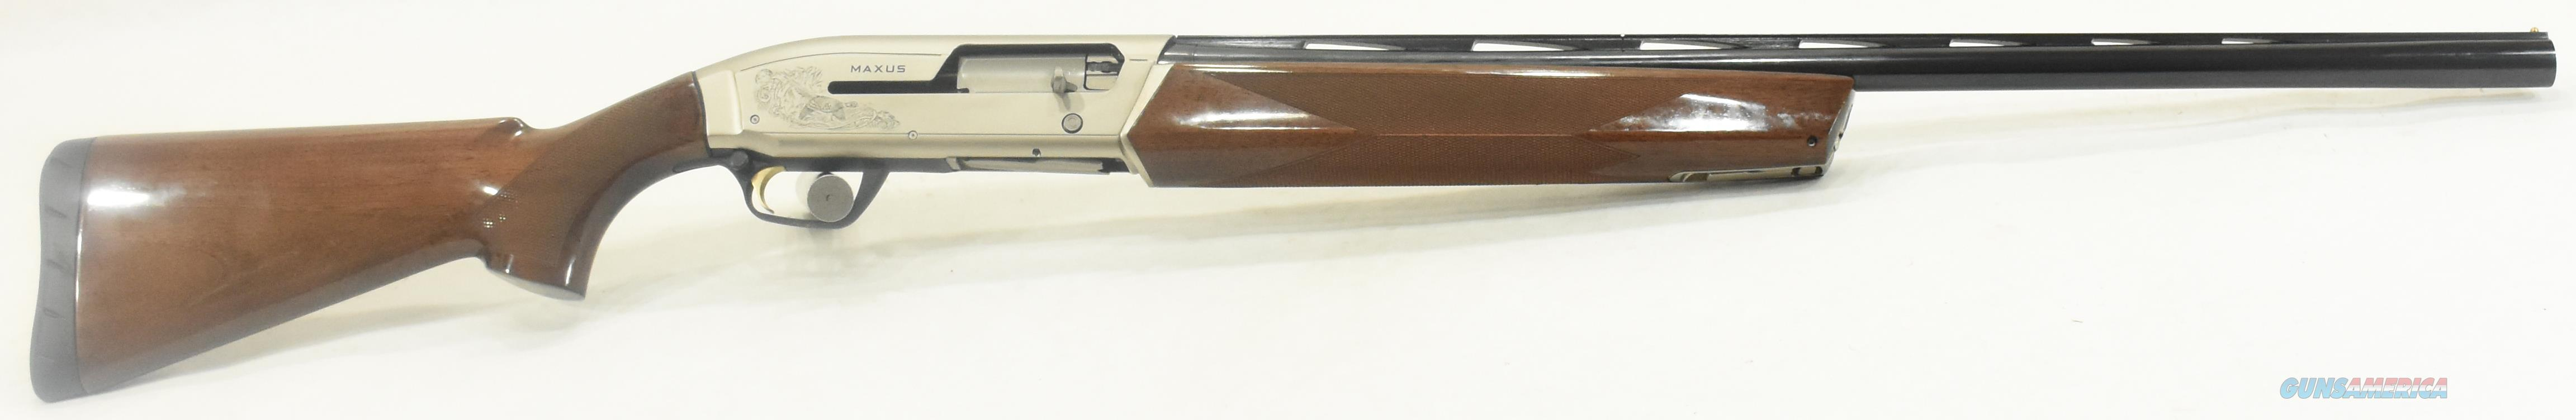 Cynergy Micro Midas 20Ga 26-3In 018701605  Guns > Shotguns > Browning Shotguns > Over Unders > Cynergy > Hunting